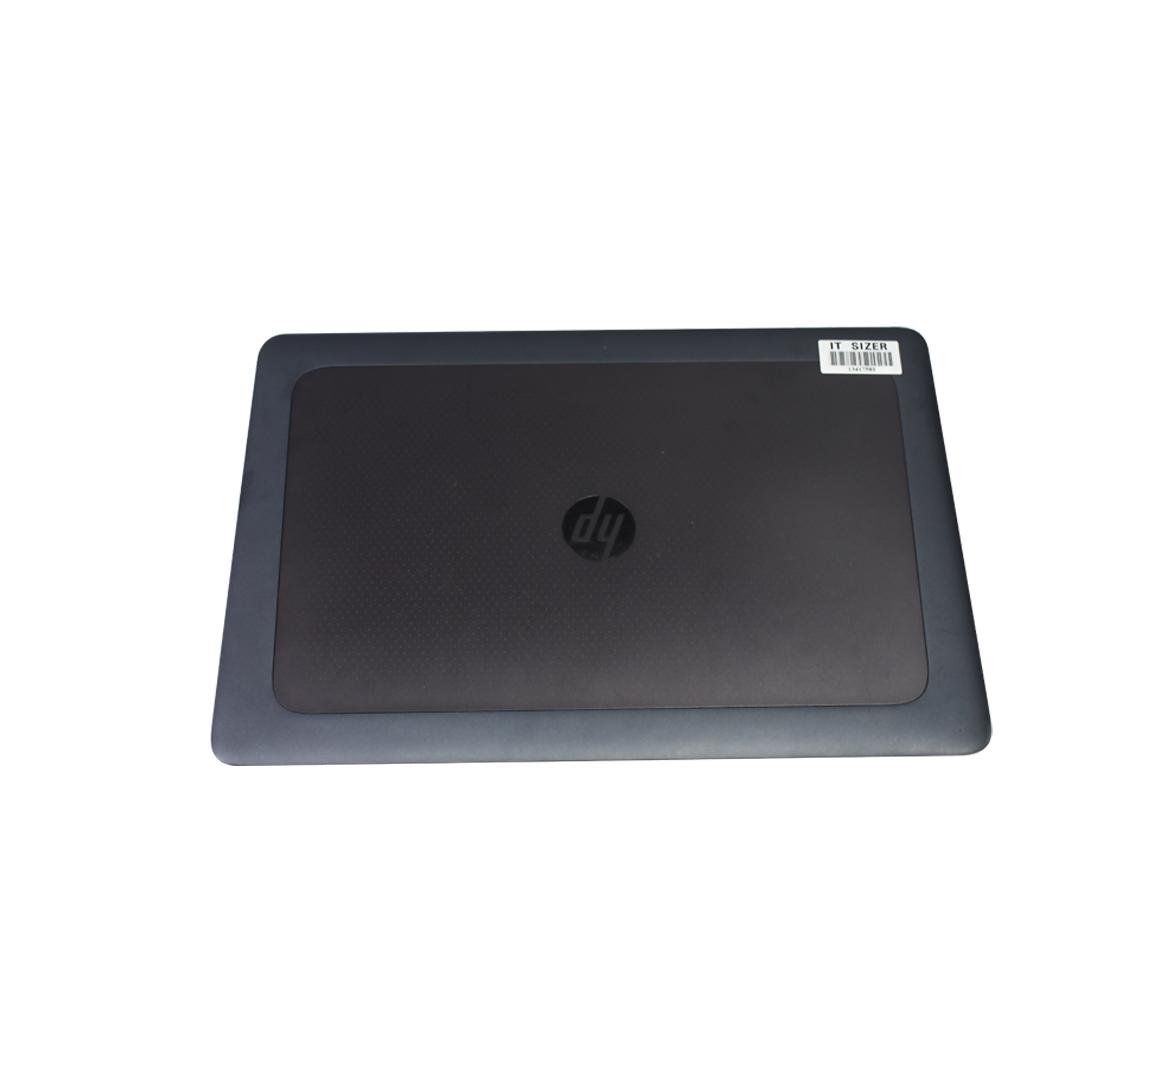 HP ZBook 17 G3 Business Laptop, Intel Core i7-6700MQ CPU, 16GB DDR4 SODIMM RAM, 256GB SSD 2.5, 17 inch Display, Windows 10 Pro (Refurbished)